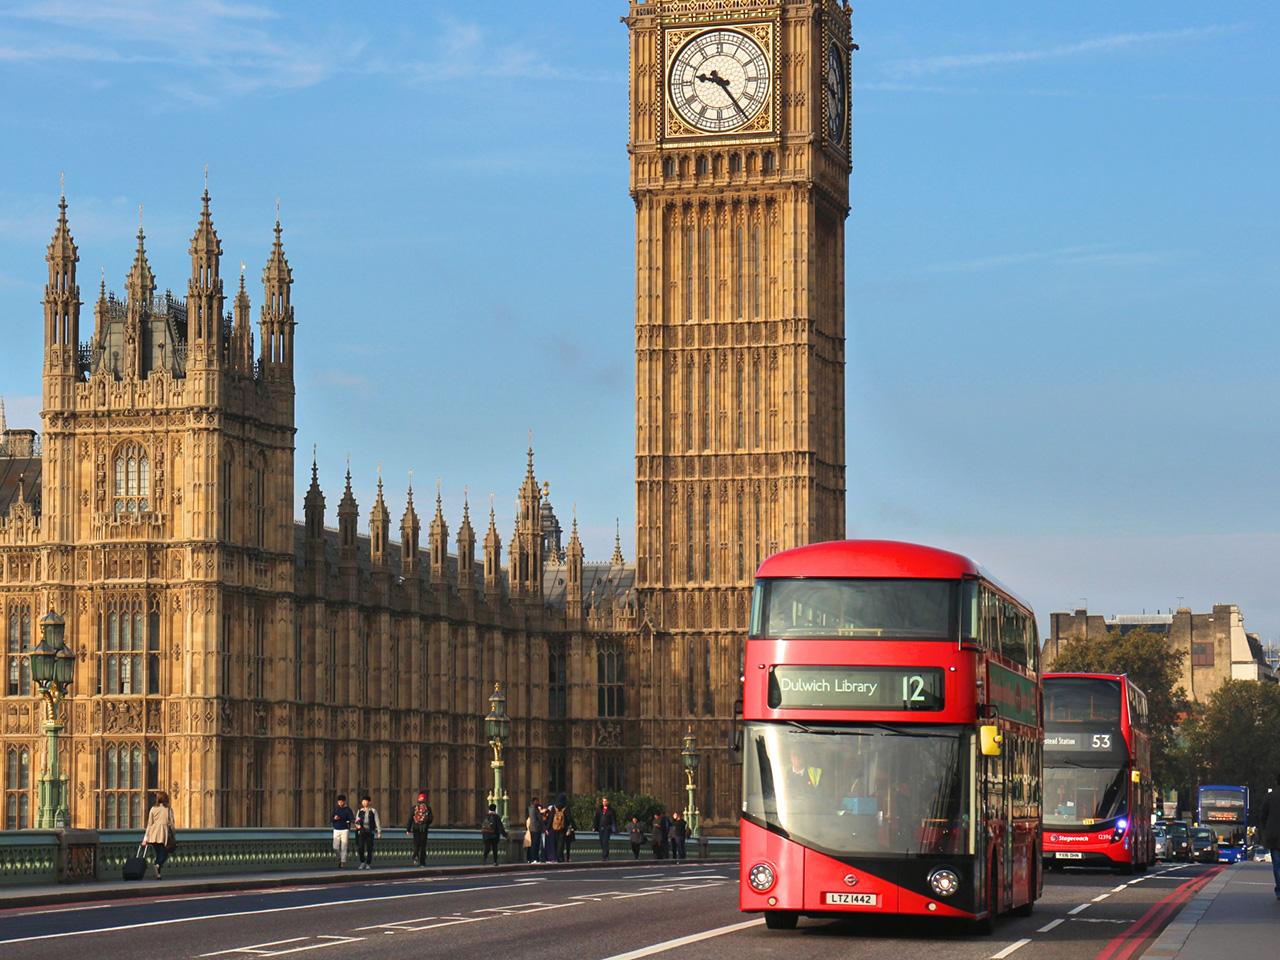 20180227_london_bus